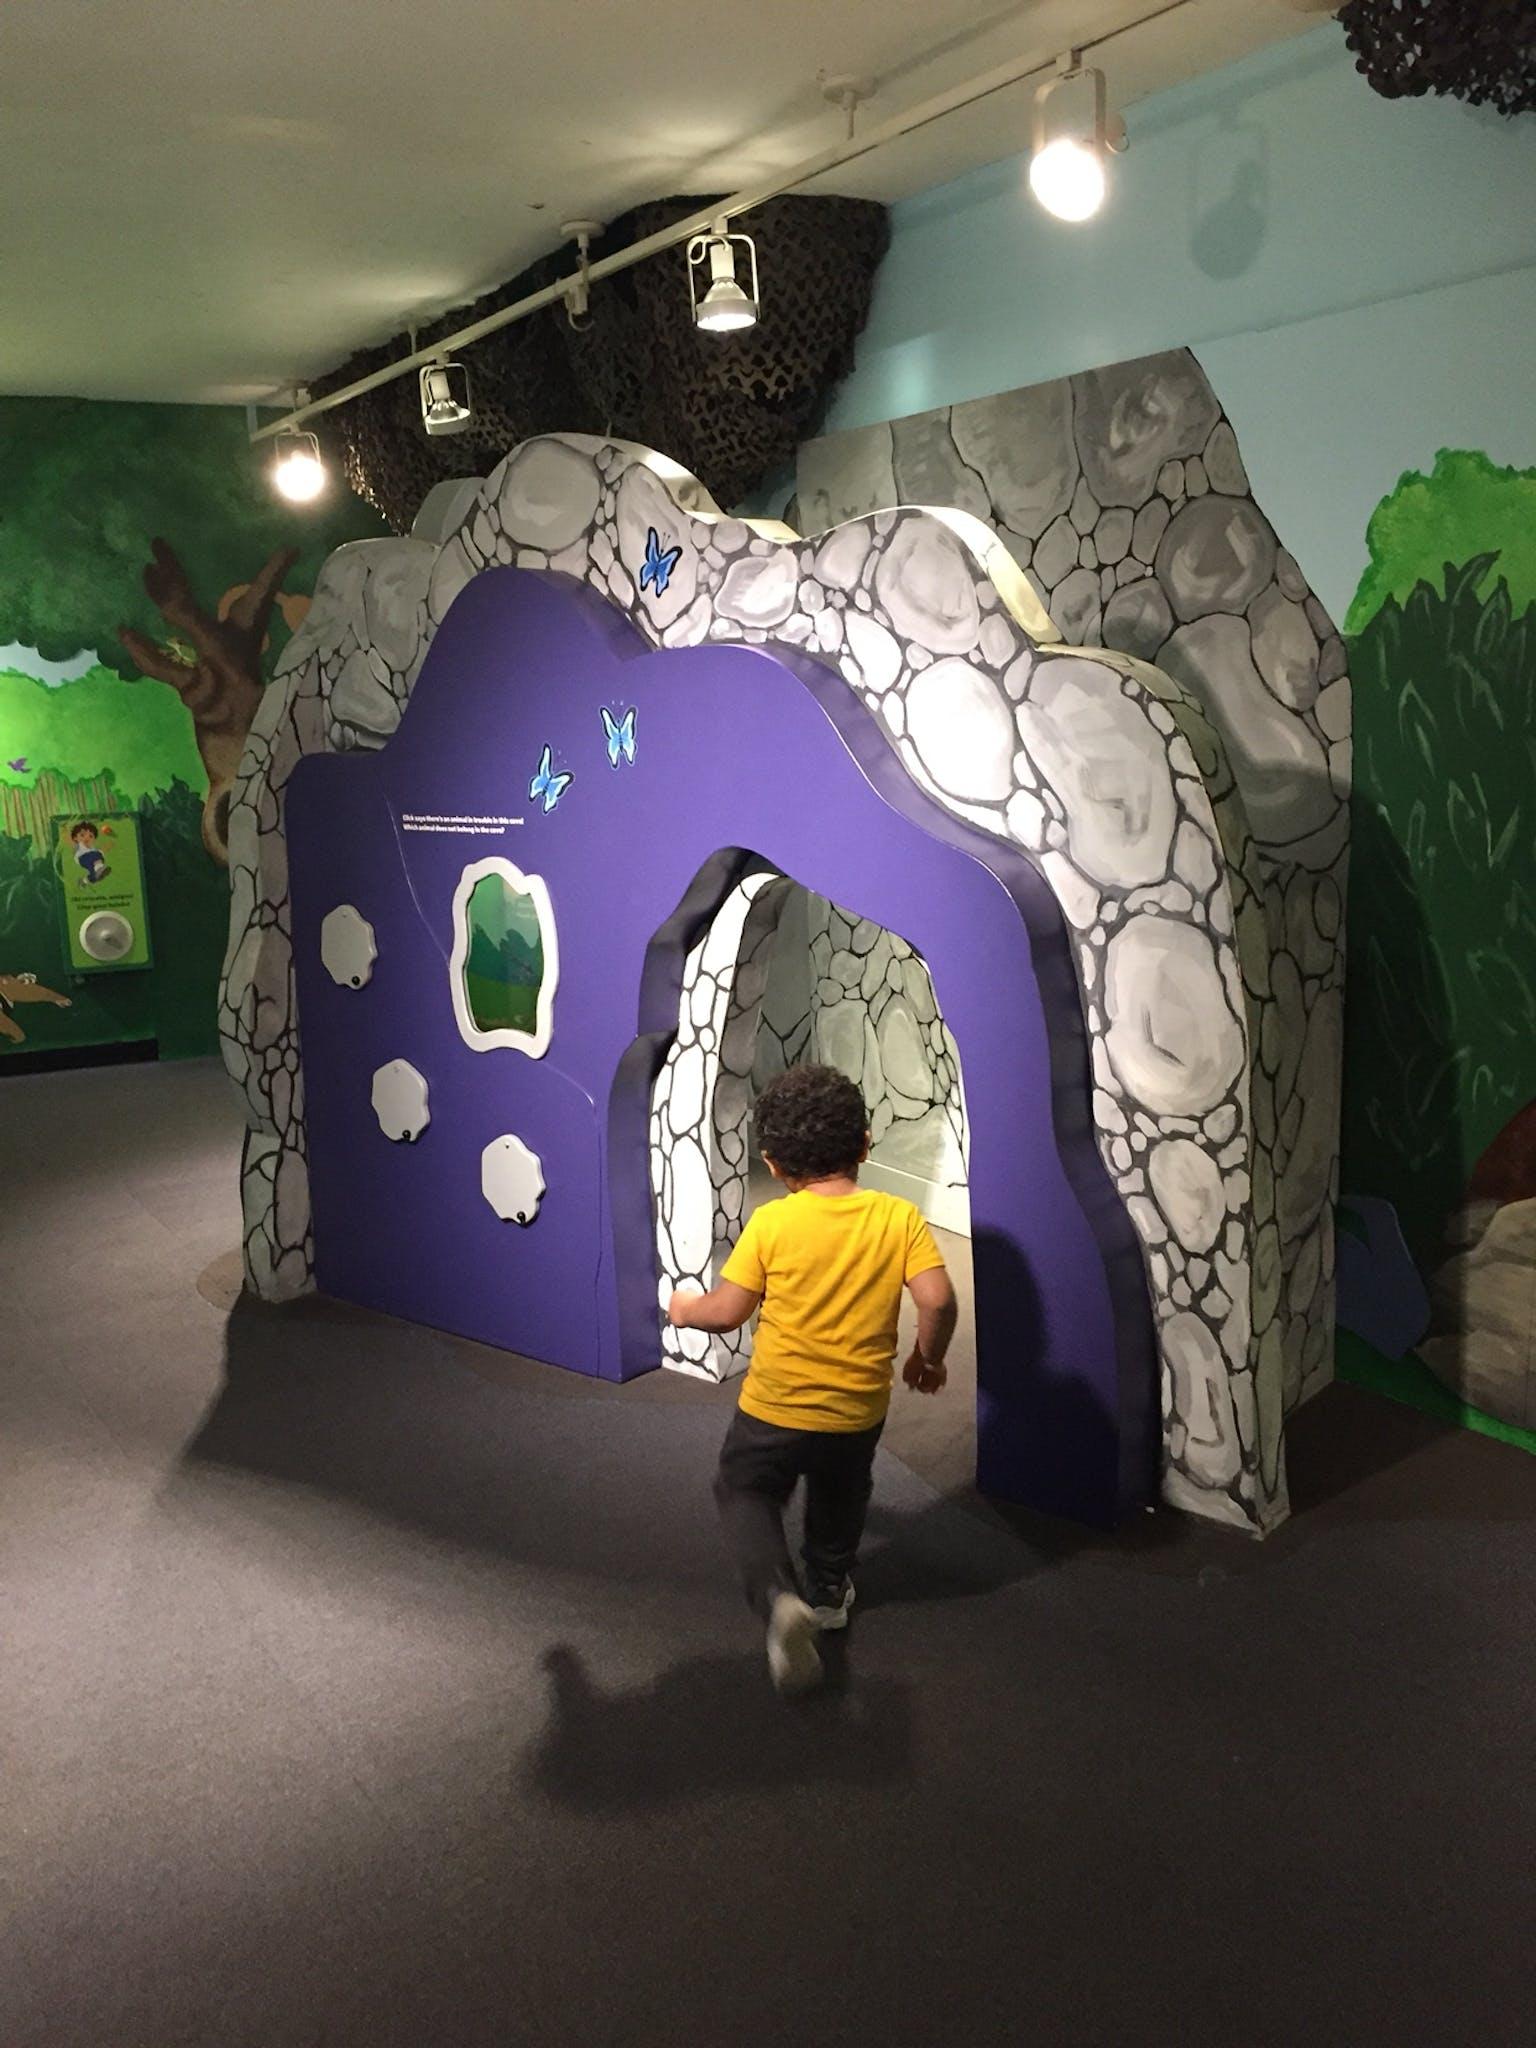 Children's Museum of Manhattan (CMOM) in New York, NY